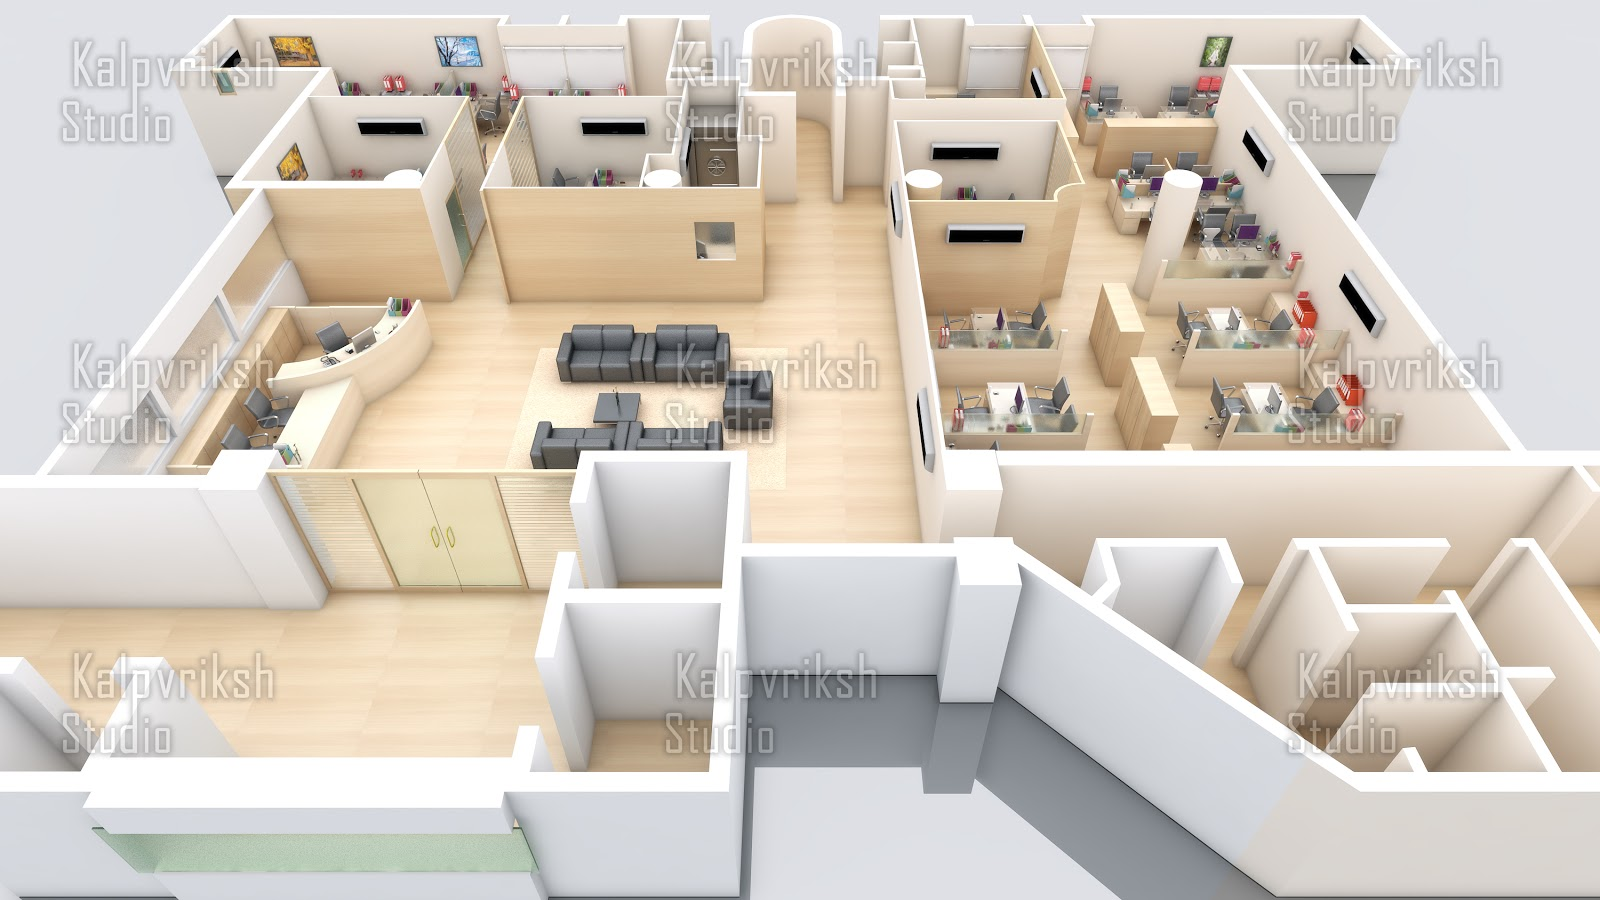 Office interior kalpvriksh studio for Office interior projects